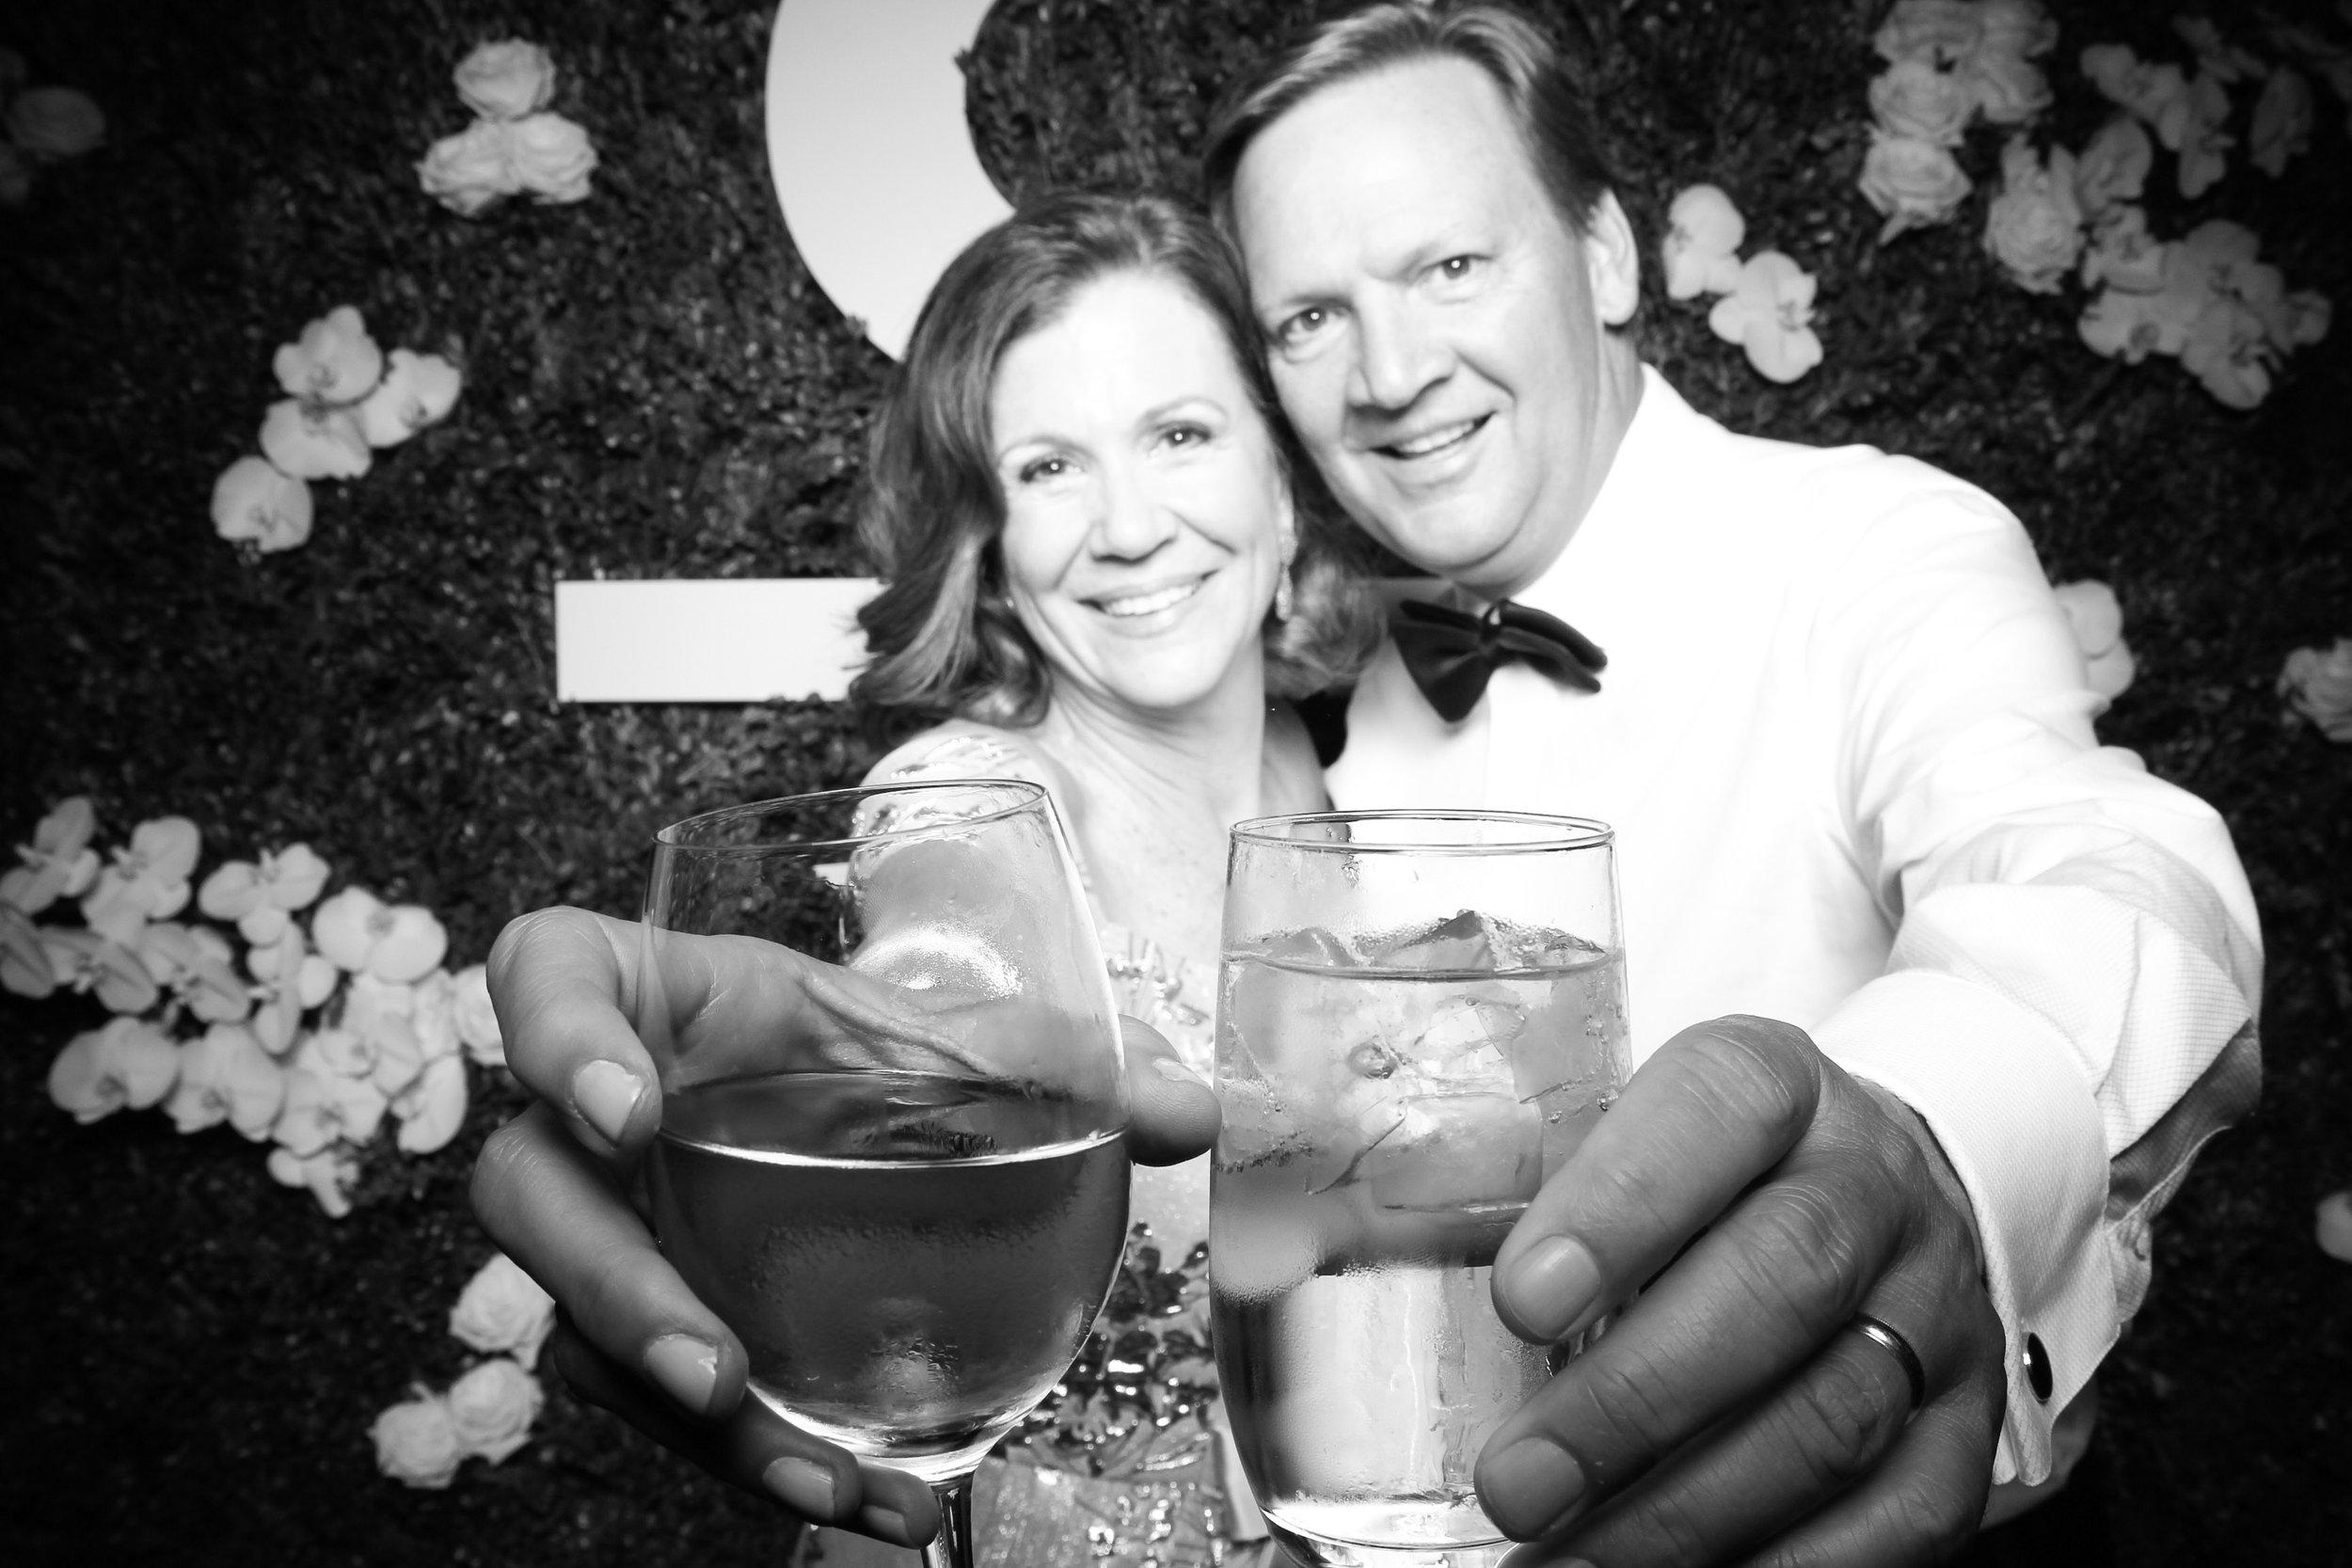 Peninsula_Hotel_Chicago_Wedding_Photo_Booth_24.jpg